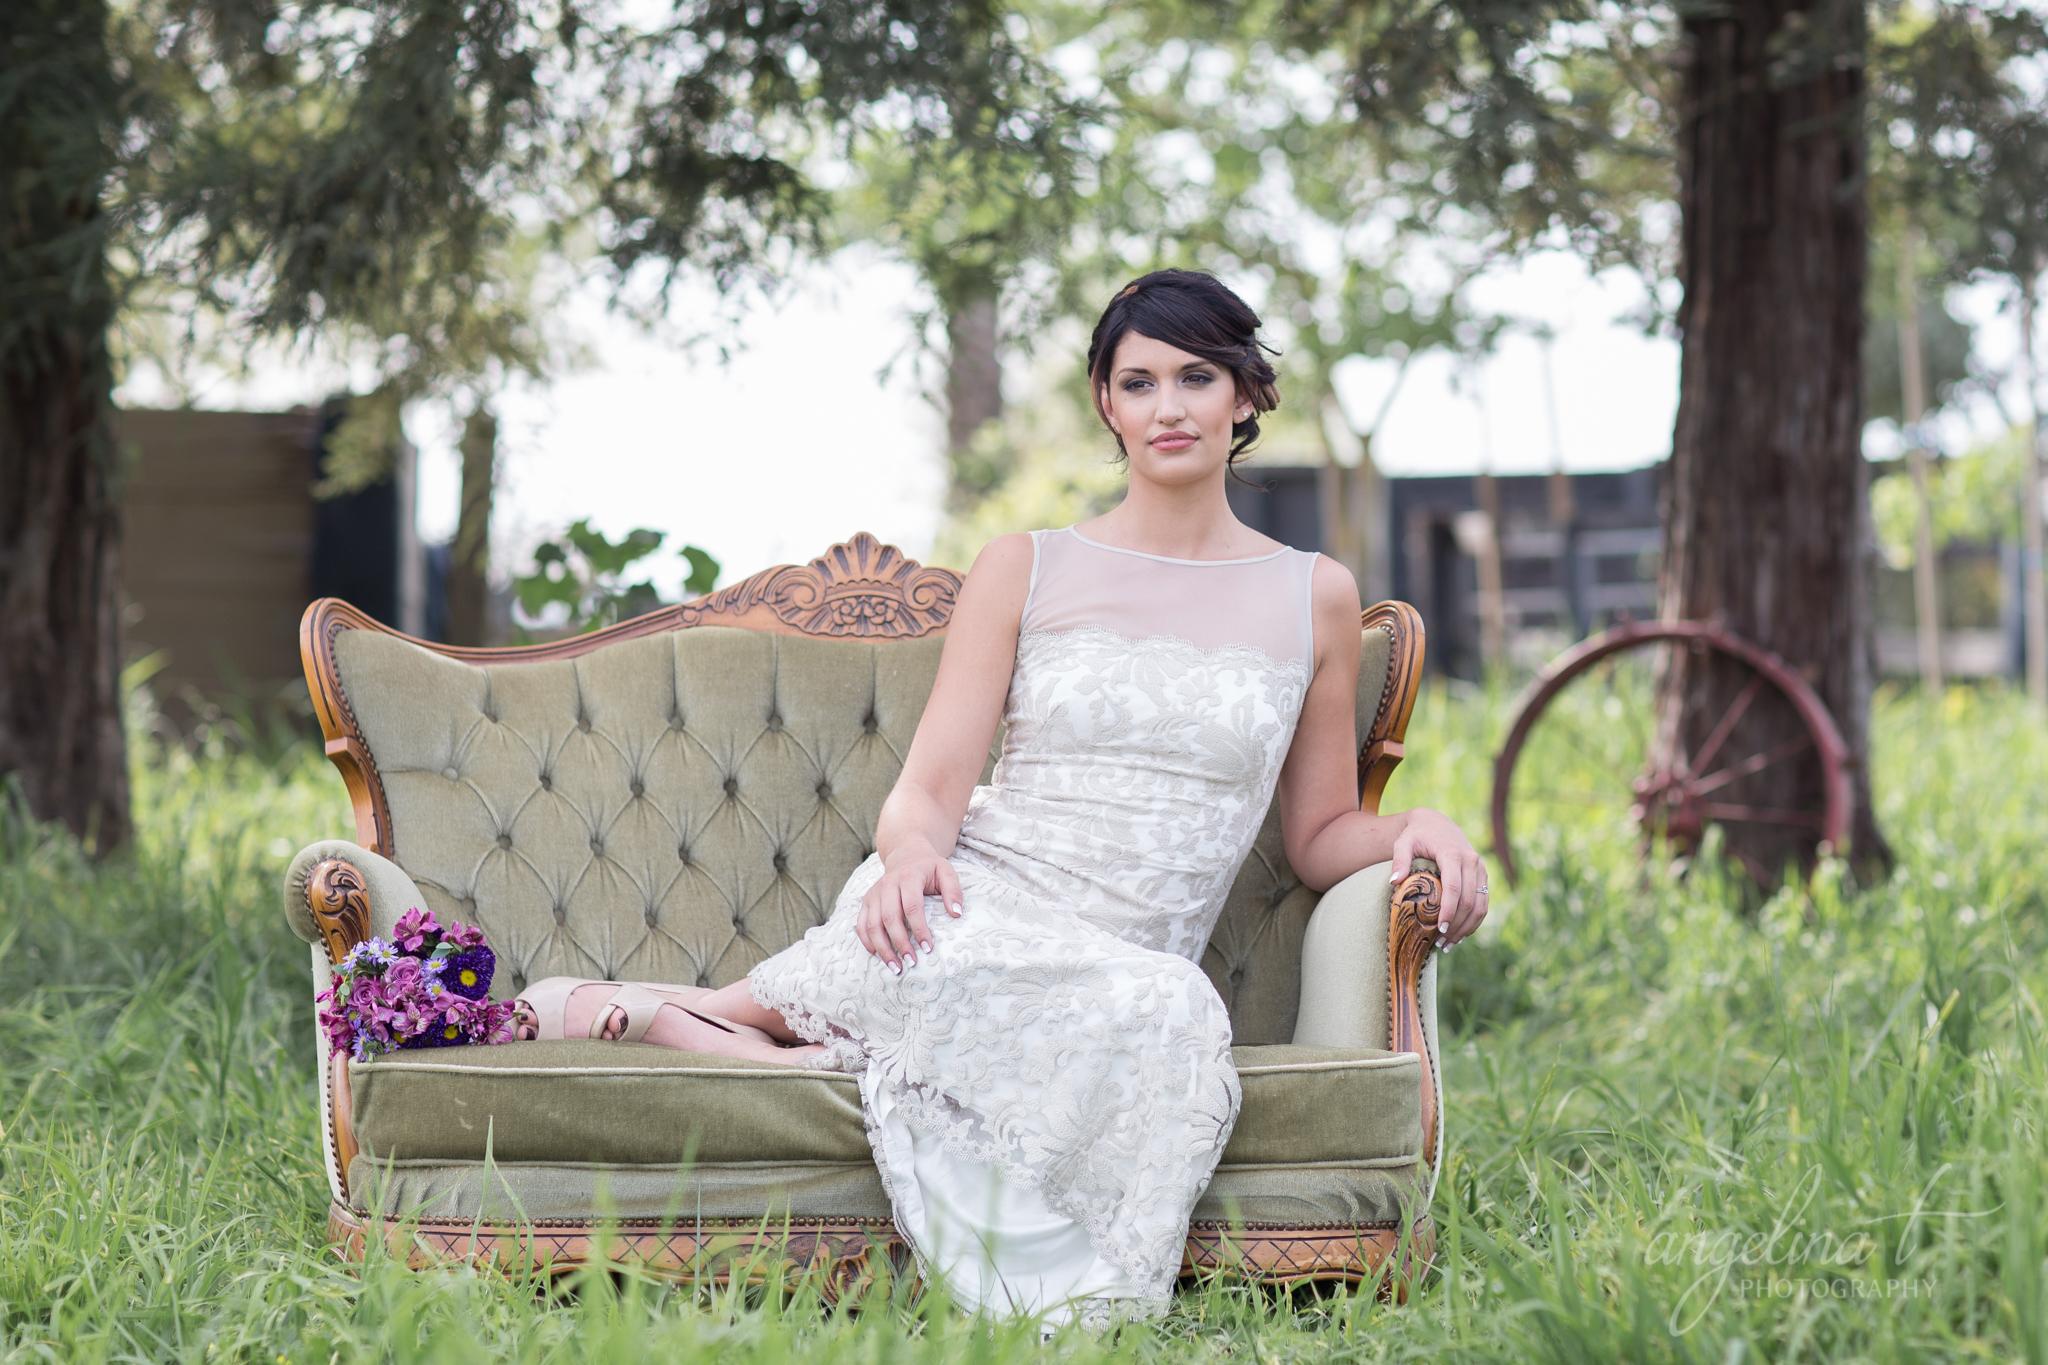 Lodi-Wedding-Photography-Ranch-01.jpg